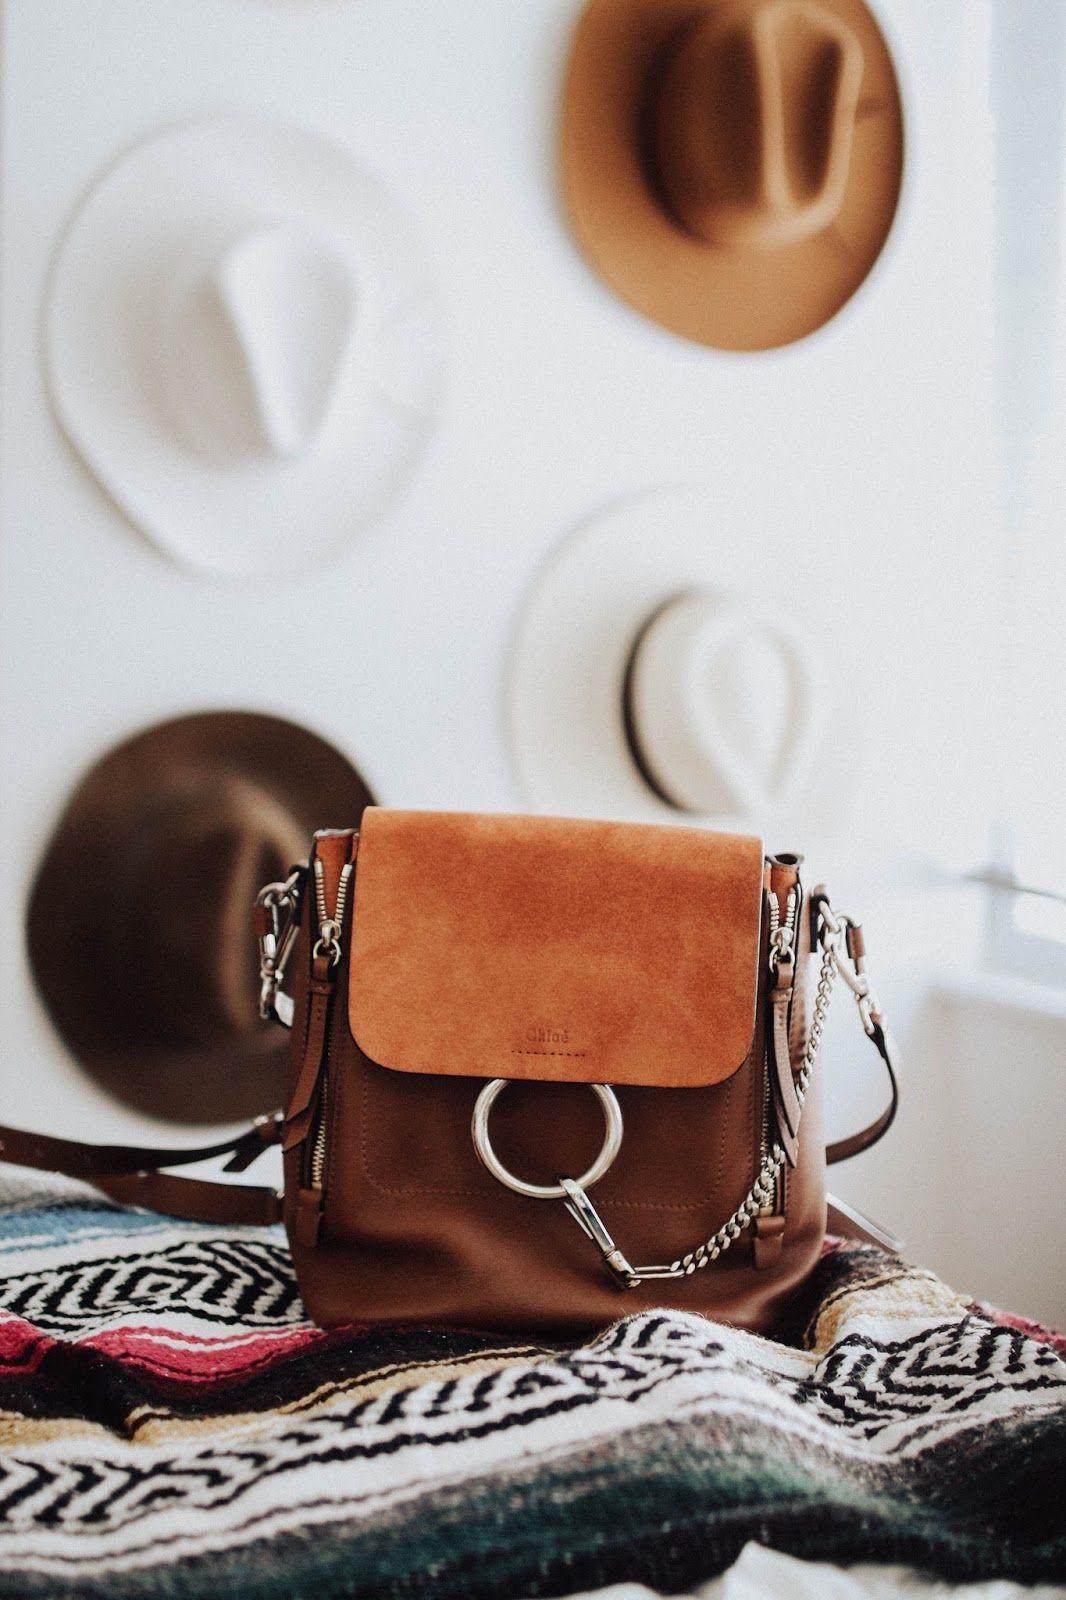 Chloe Faye Backpack Unboxing Stuff I Wish Had In 2018 Tas Import Ohanel Gratis Hijab Instan Najwa